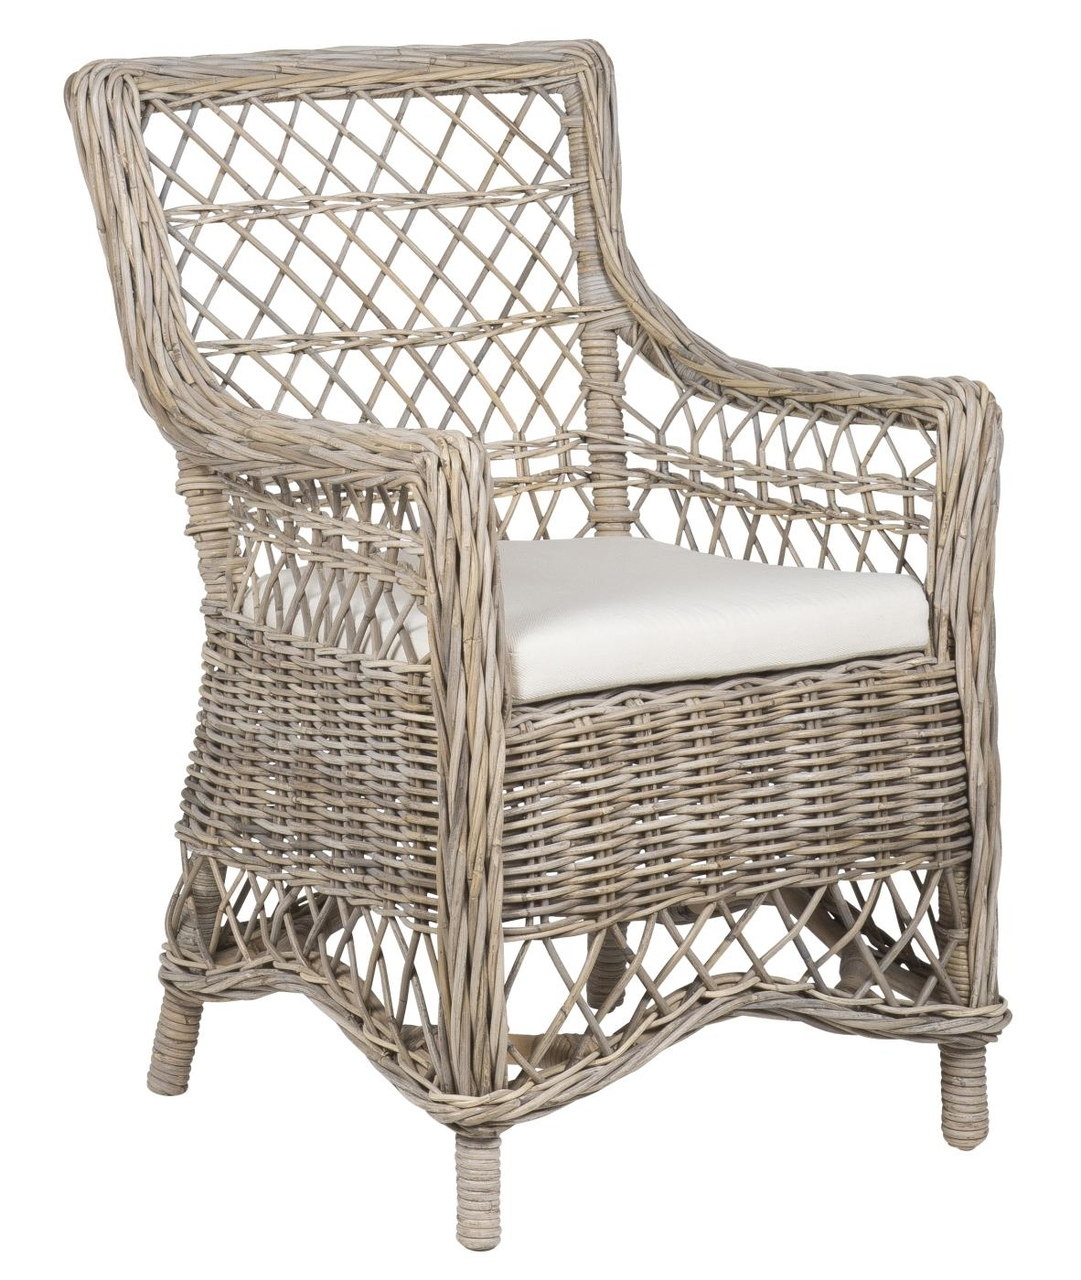 Ib Laursen Stuhl aus Rattan mit Kissen